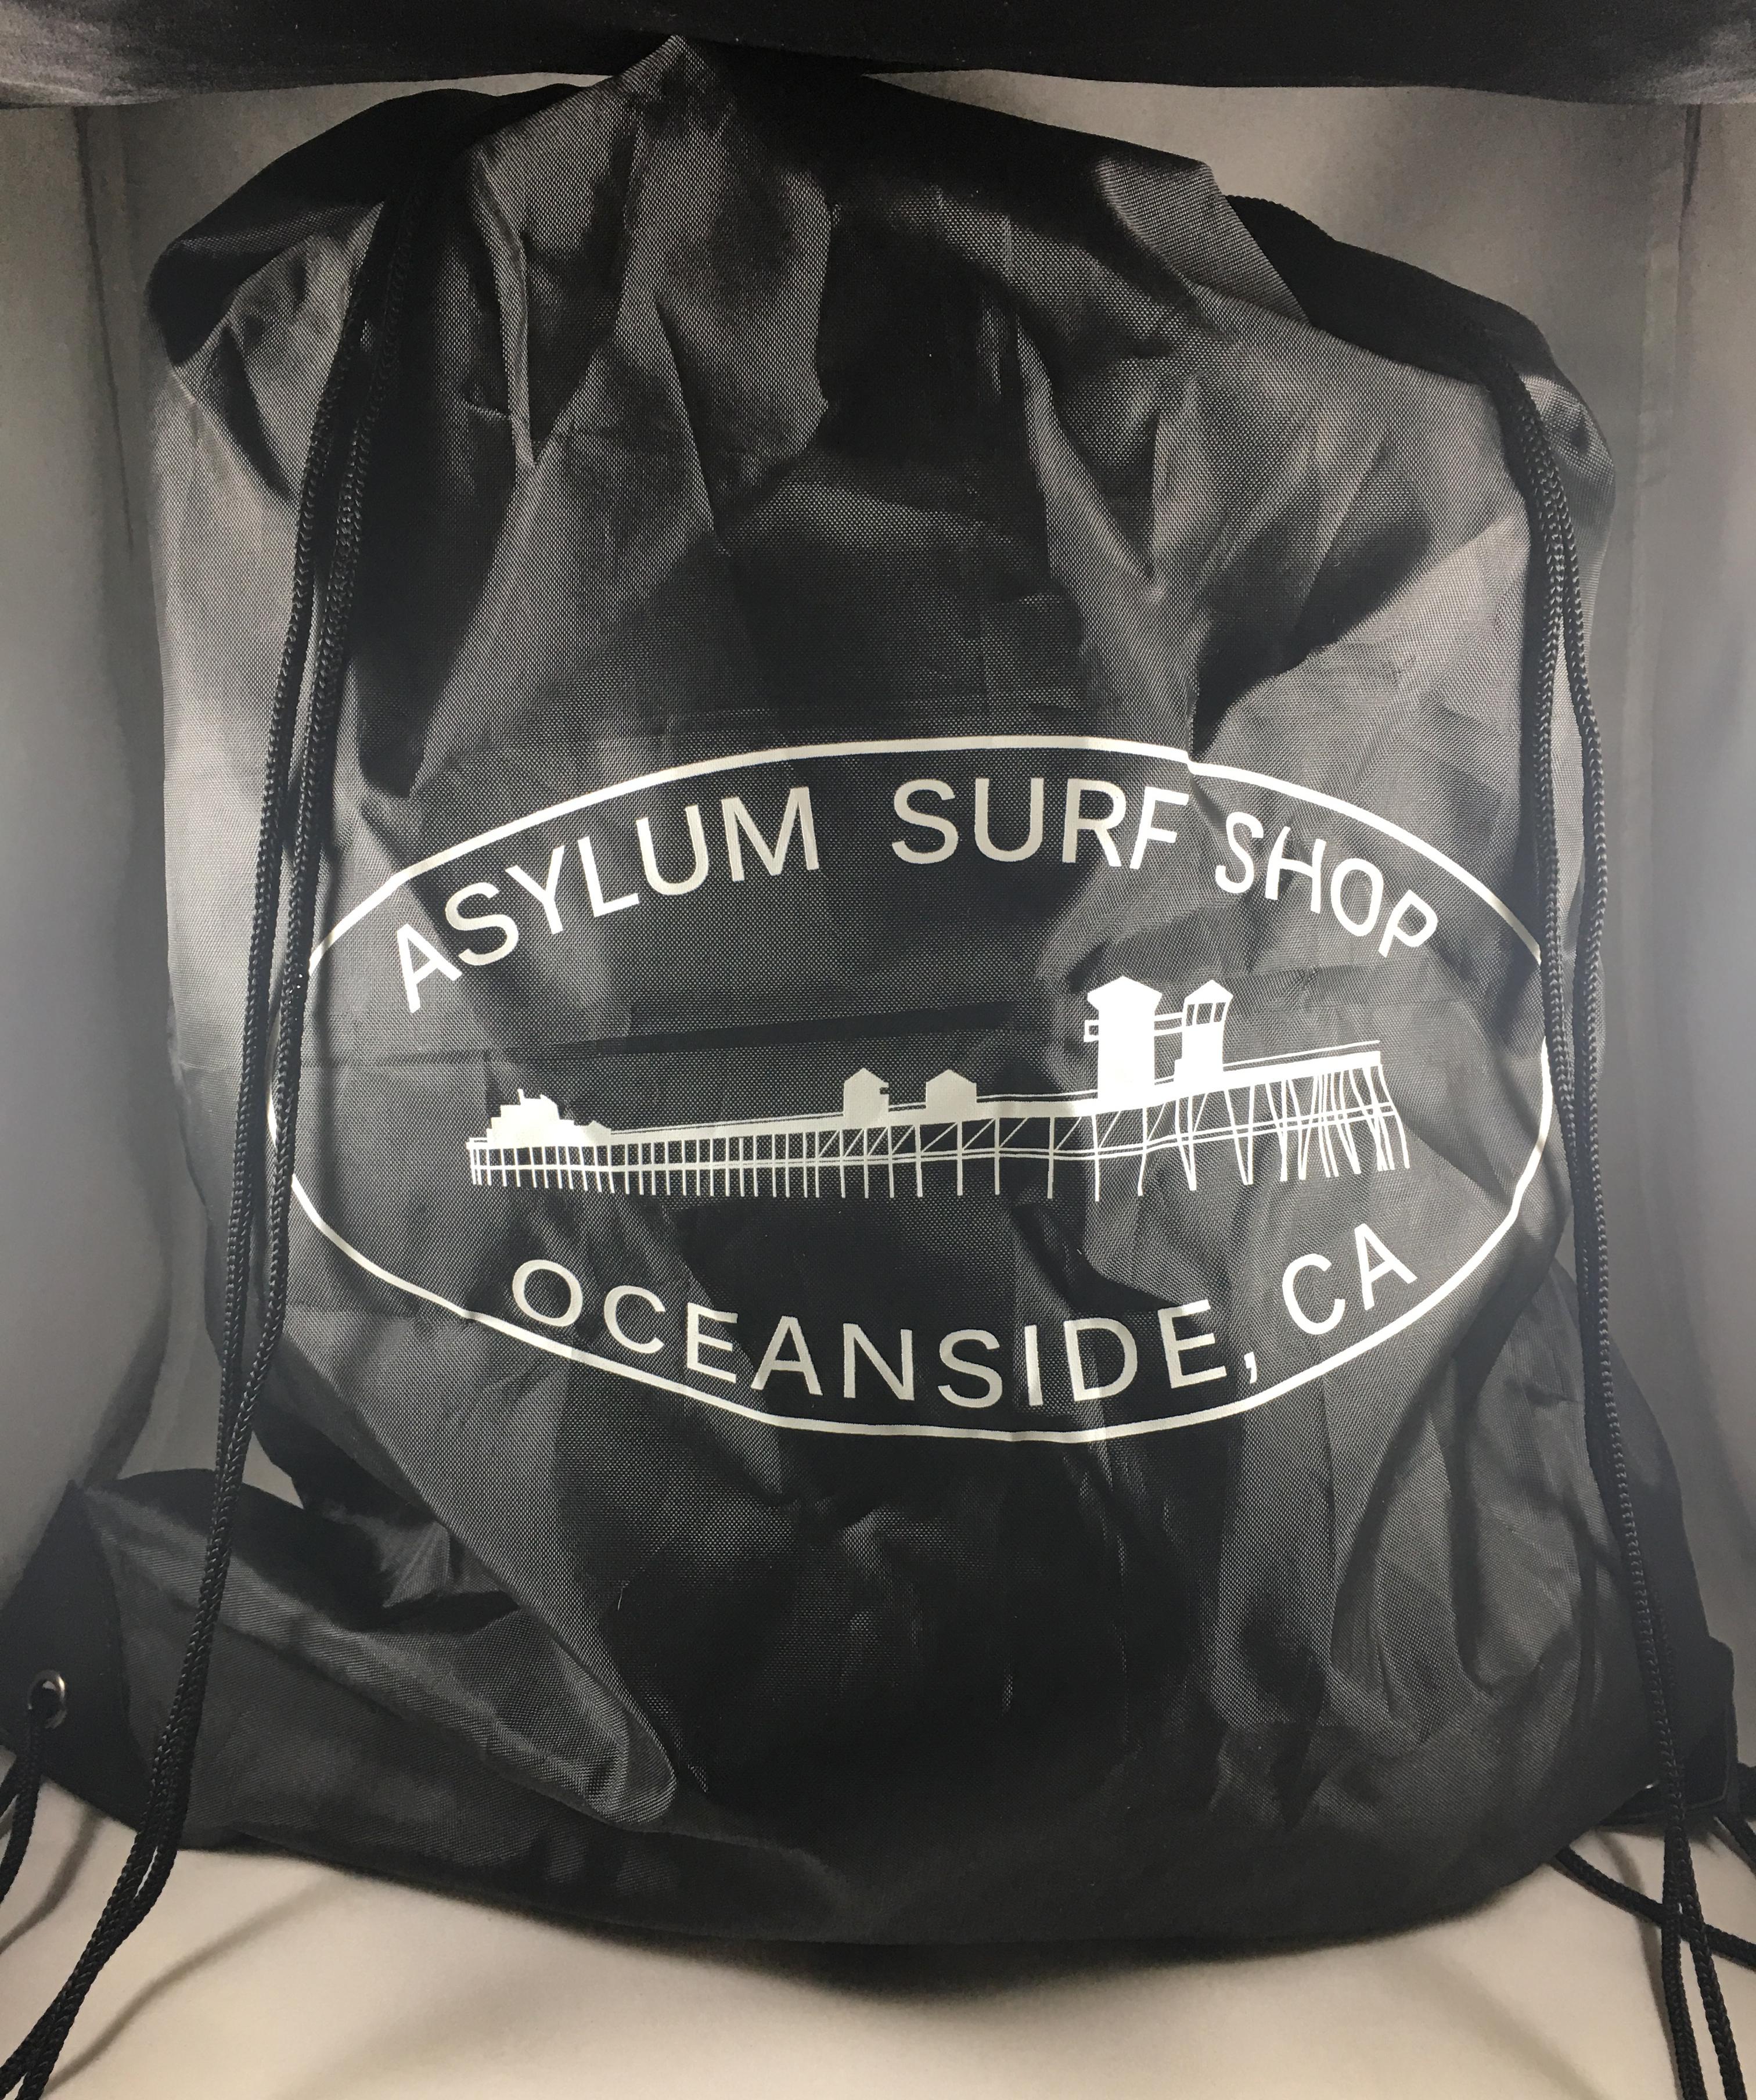 asylum Surf Shop